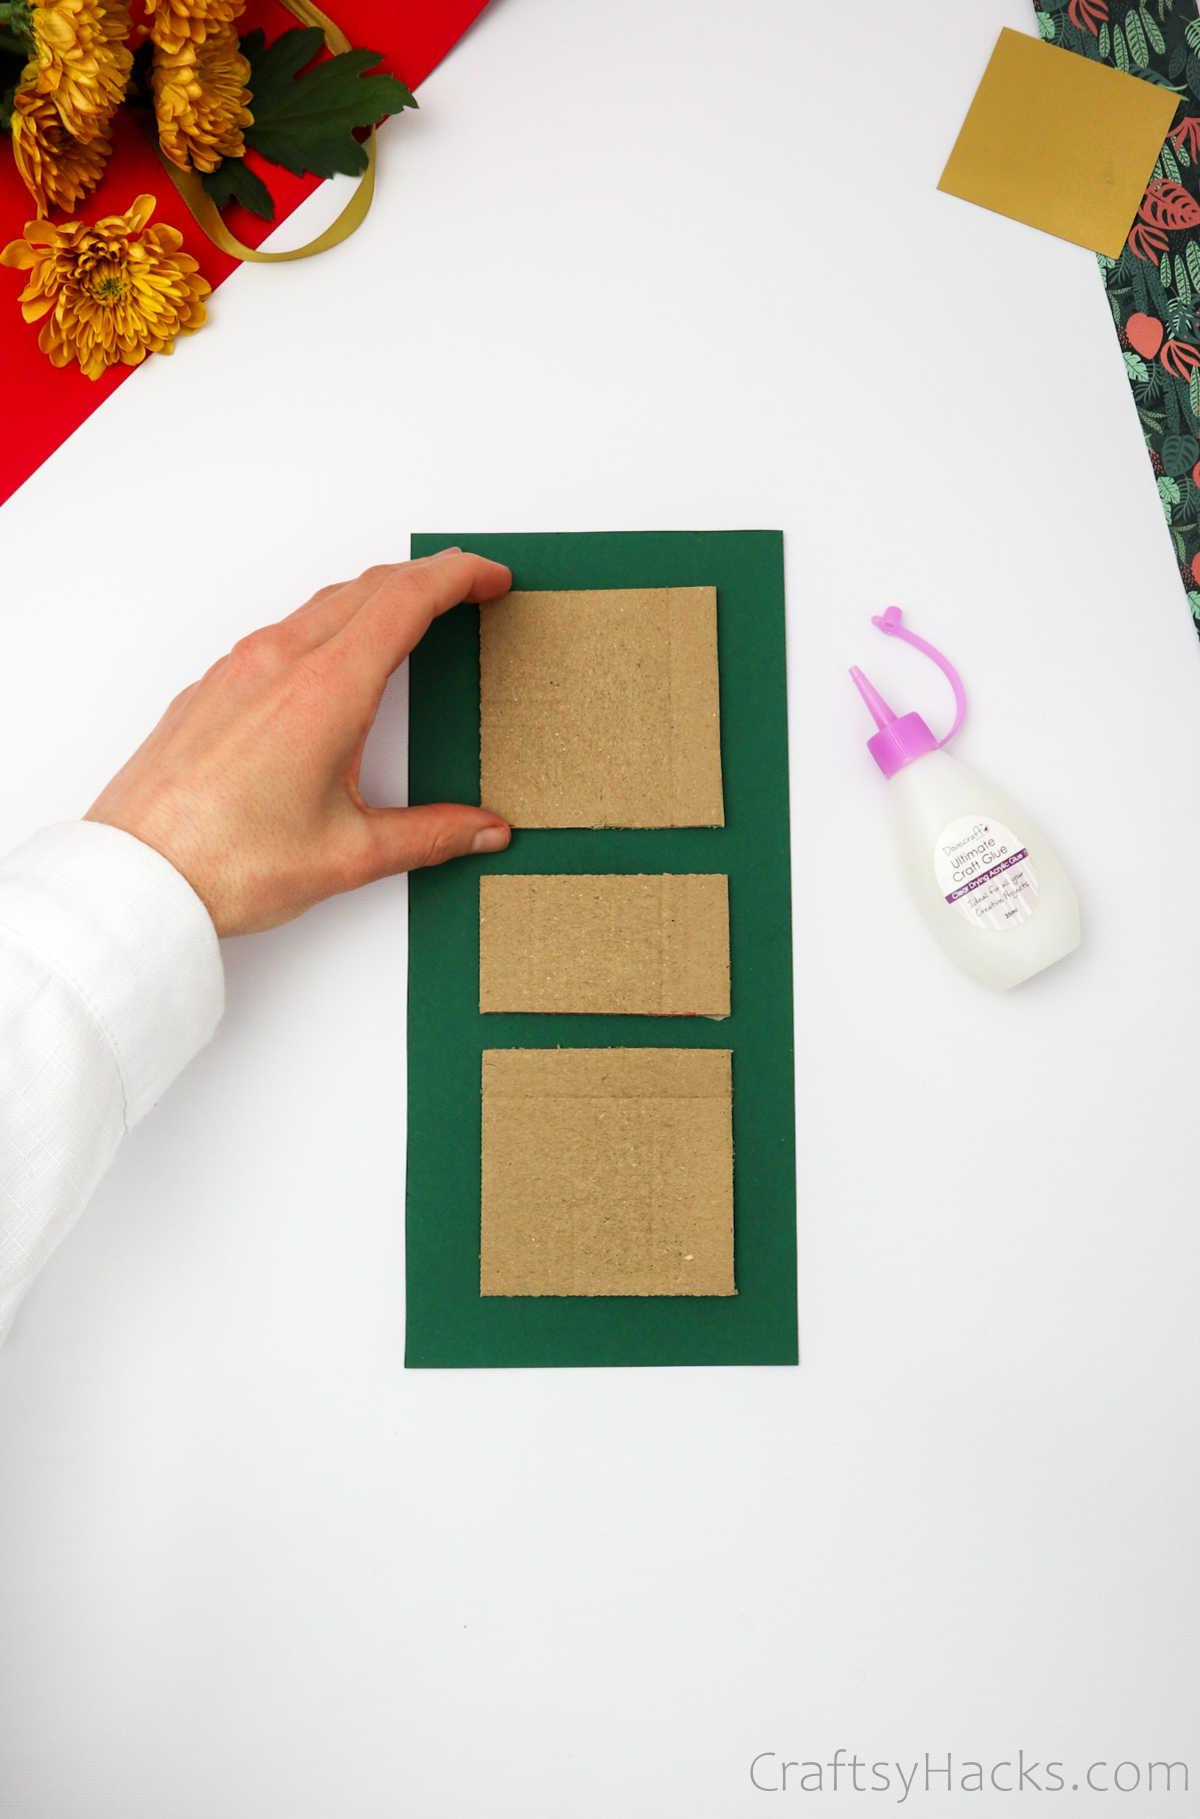 glueing cardboard squares to paper